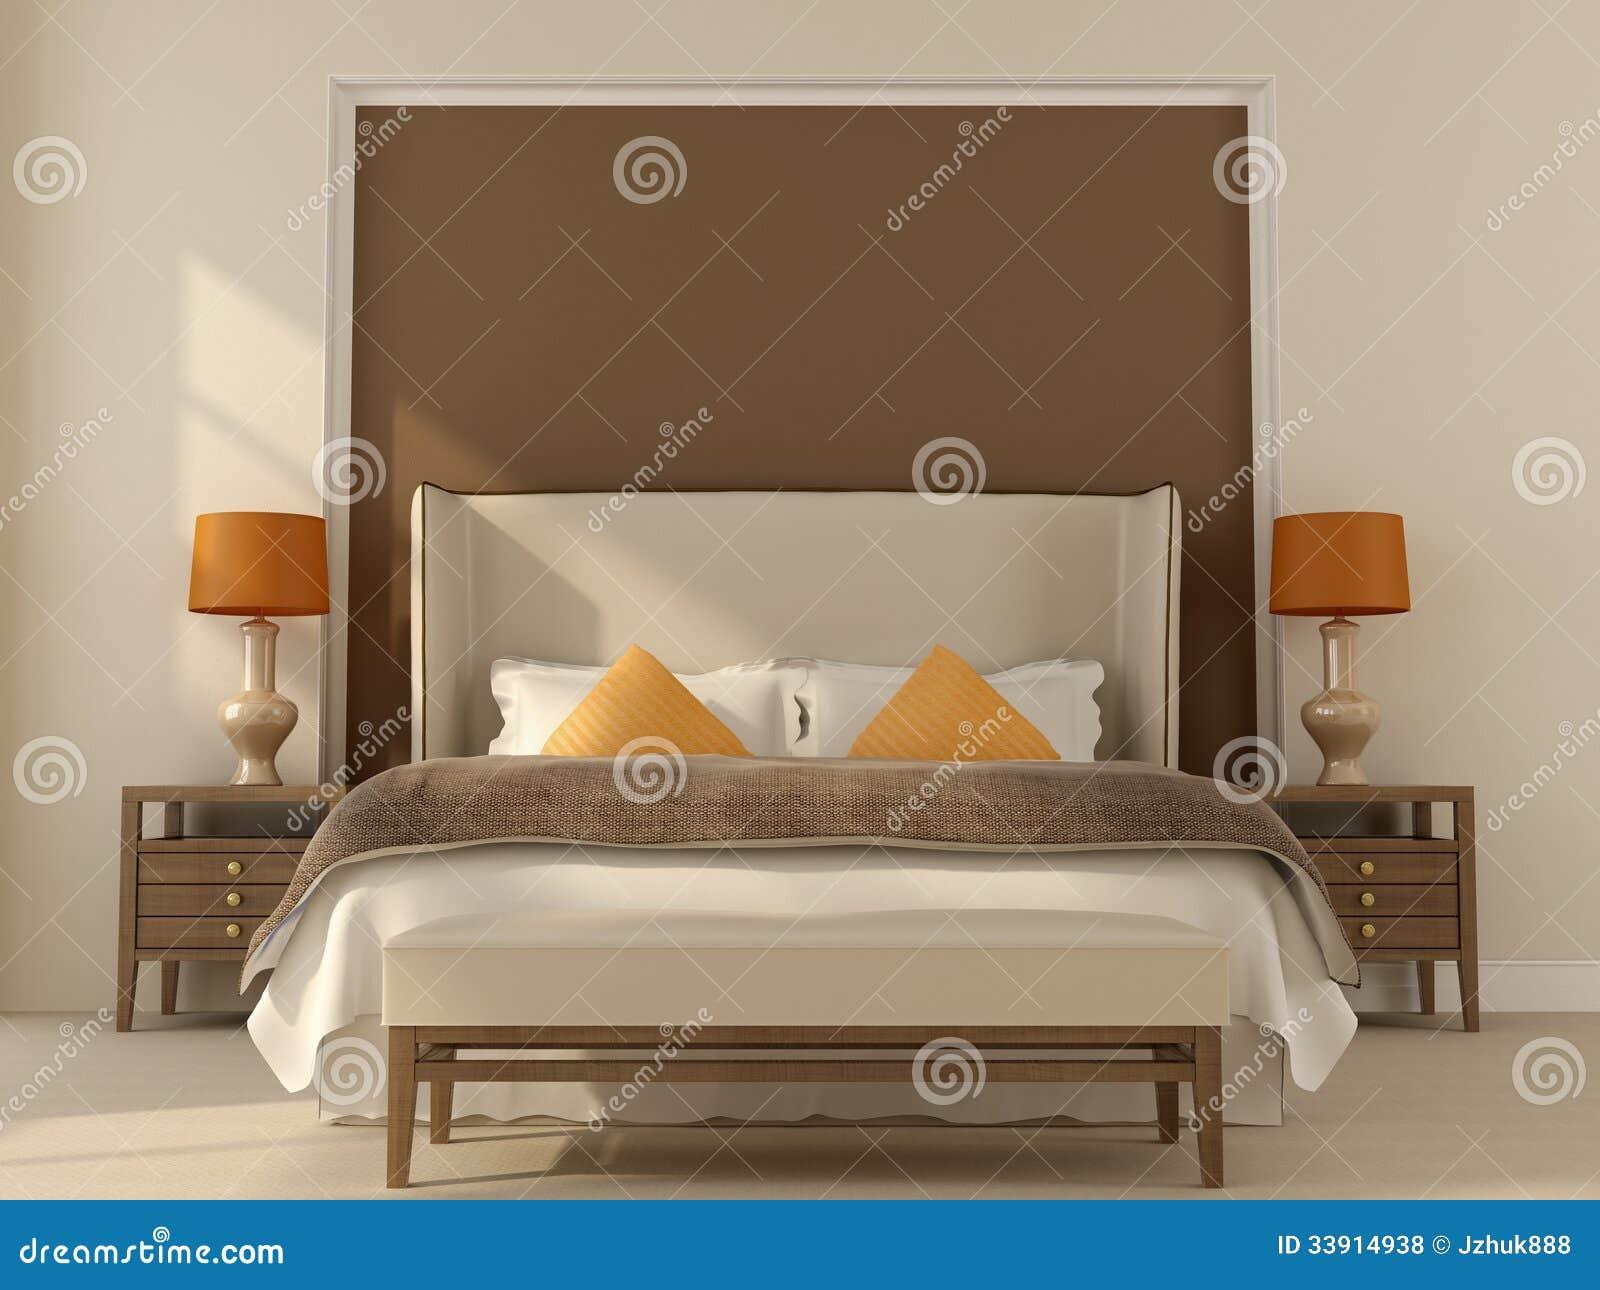 https://thumbs.dreamstime.com/z/beige-slaapkamer-met-oranje-decor-33914938.jpg